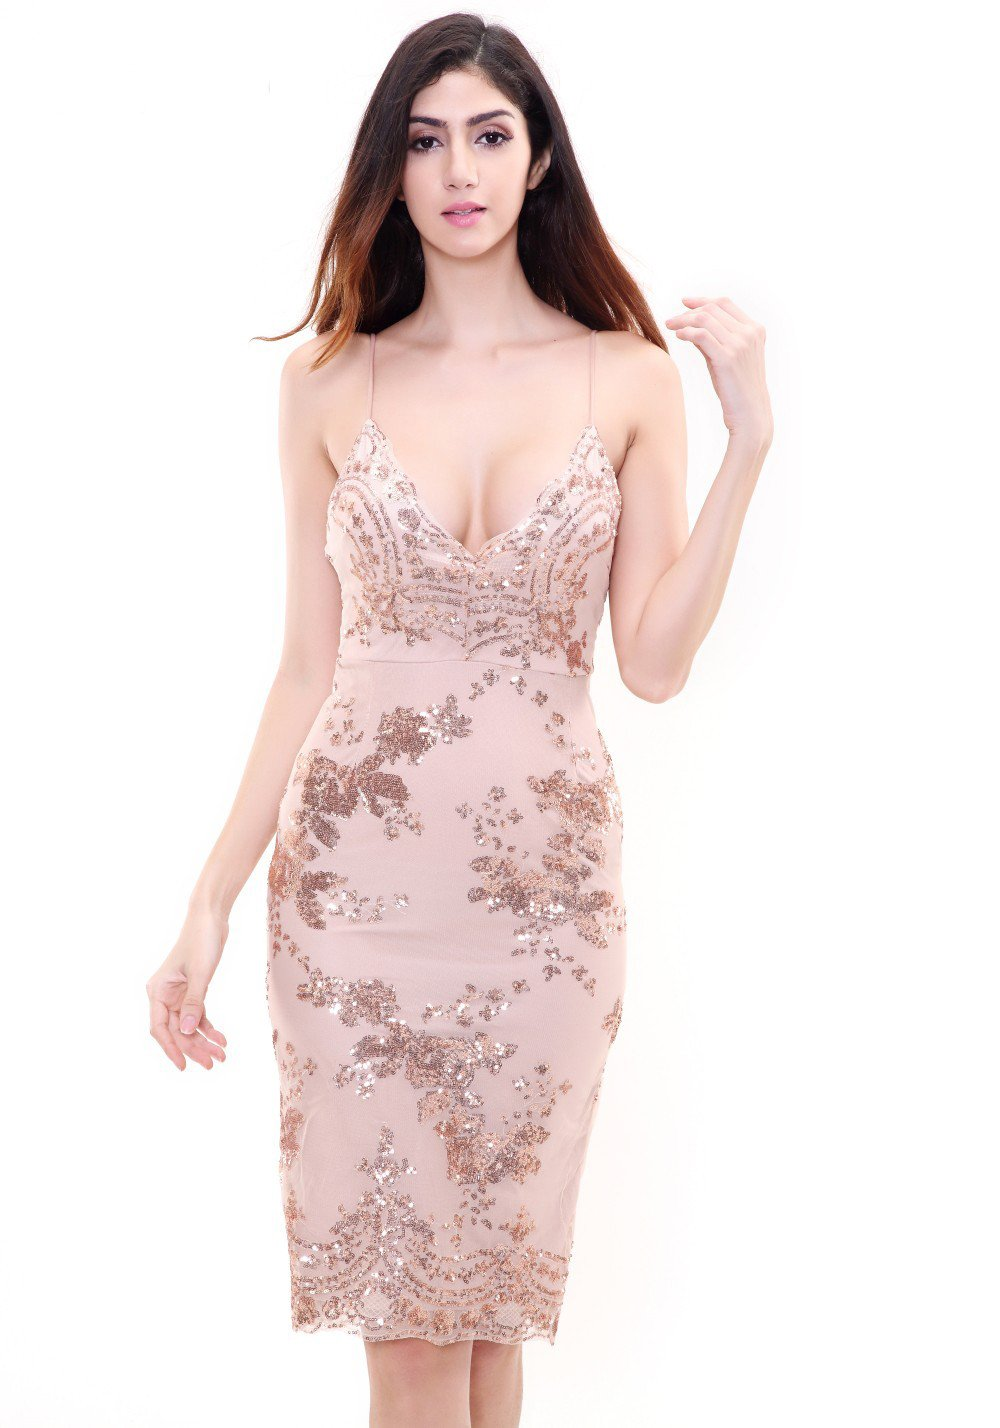 Jasmine | Detailed Sequin Dress